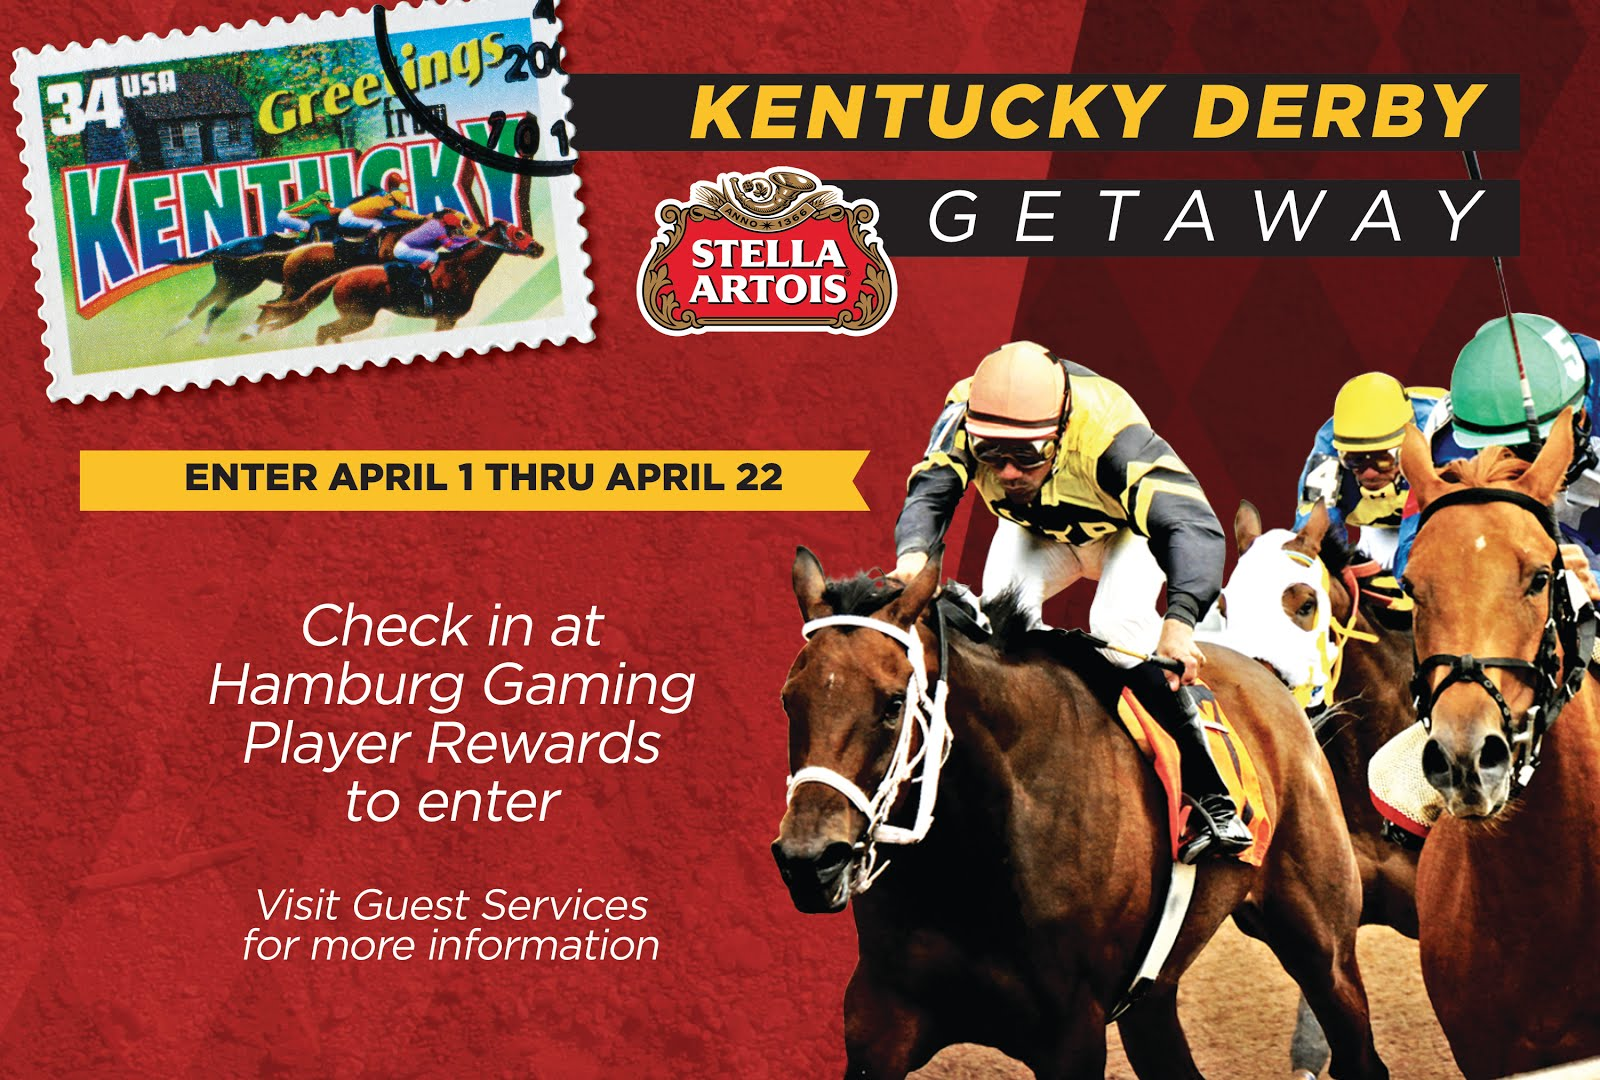 Win a trip to Kentucky Derby